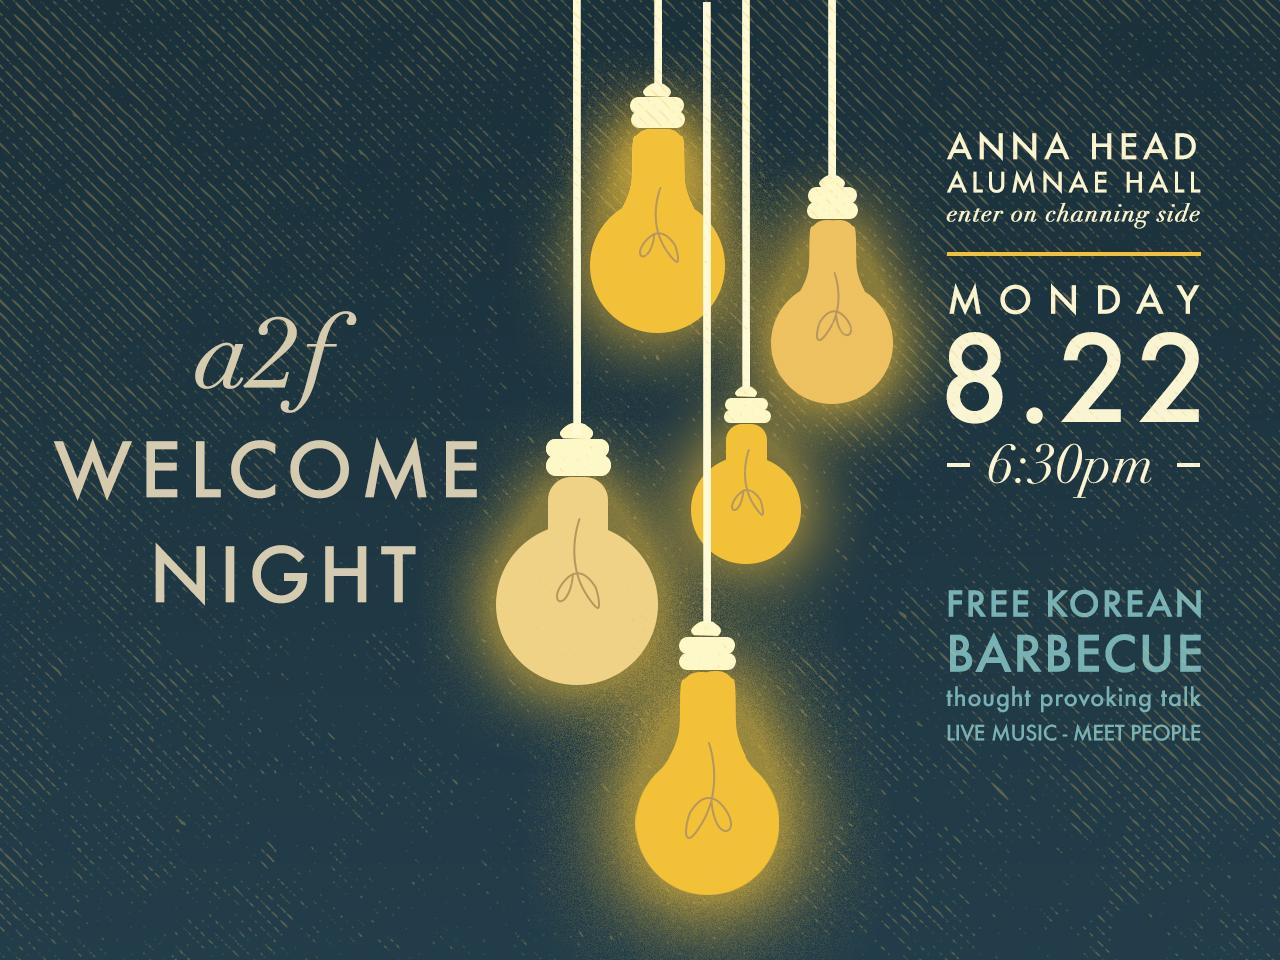 acts2fellowship-christian-fellowship-college-berkeley-welcome-night